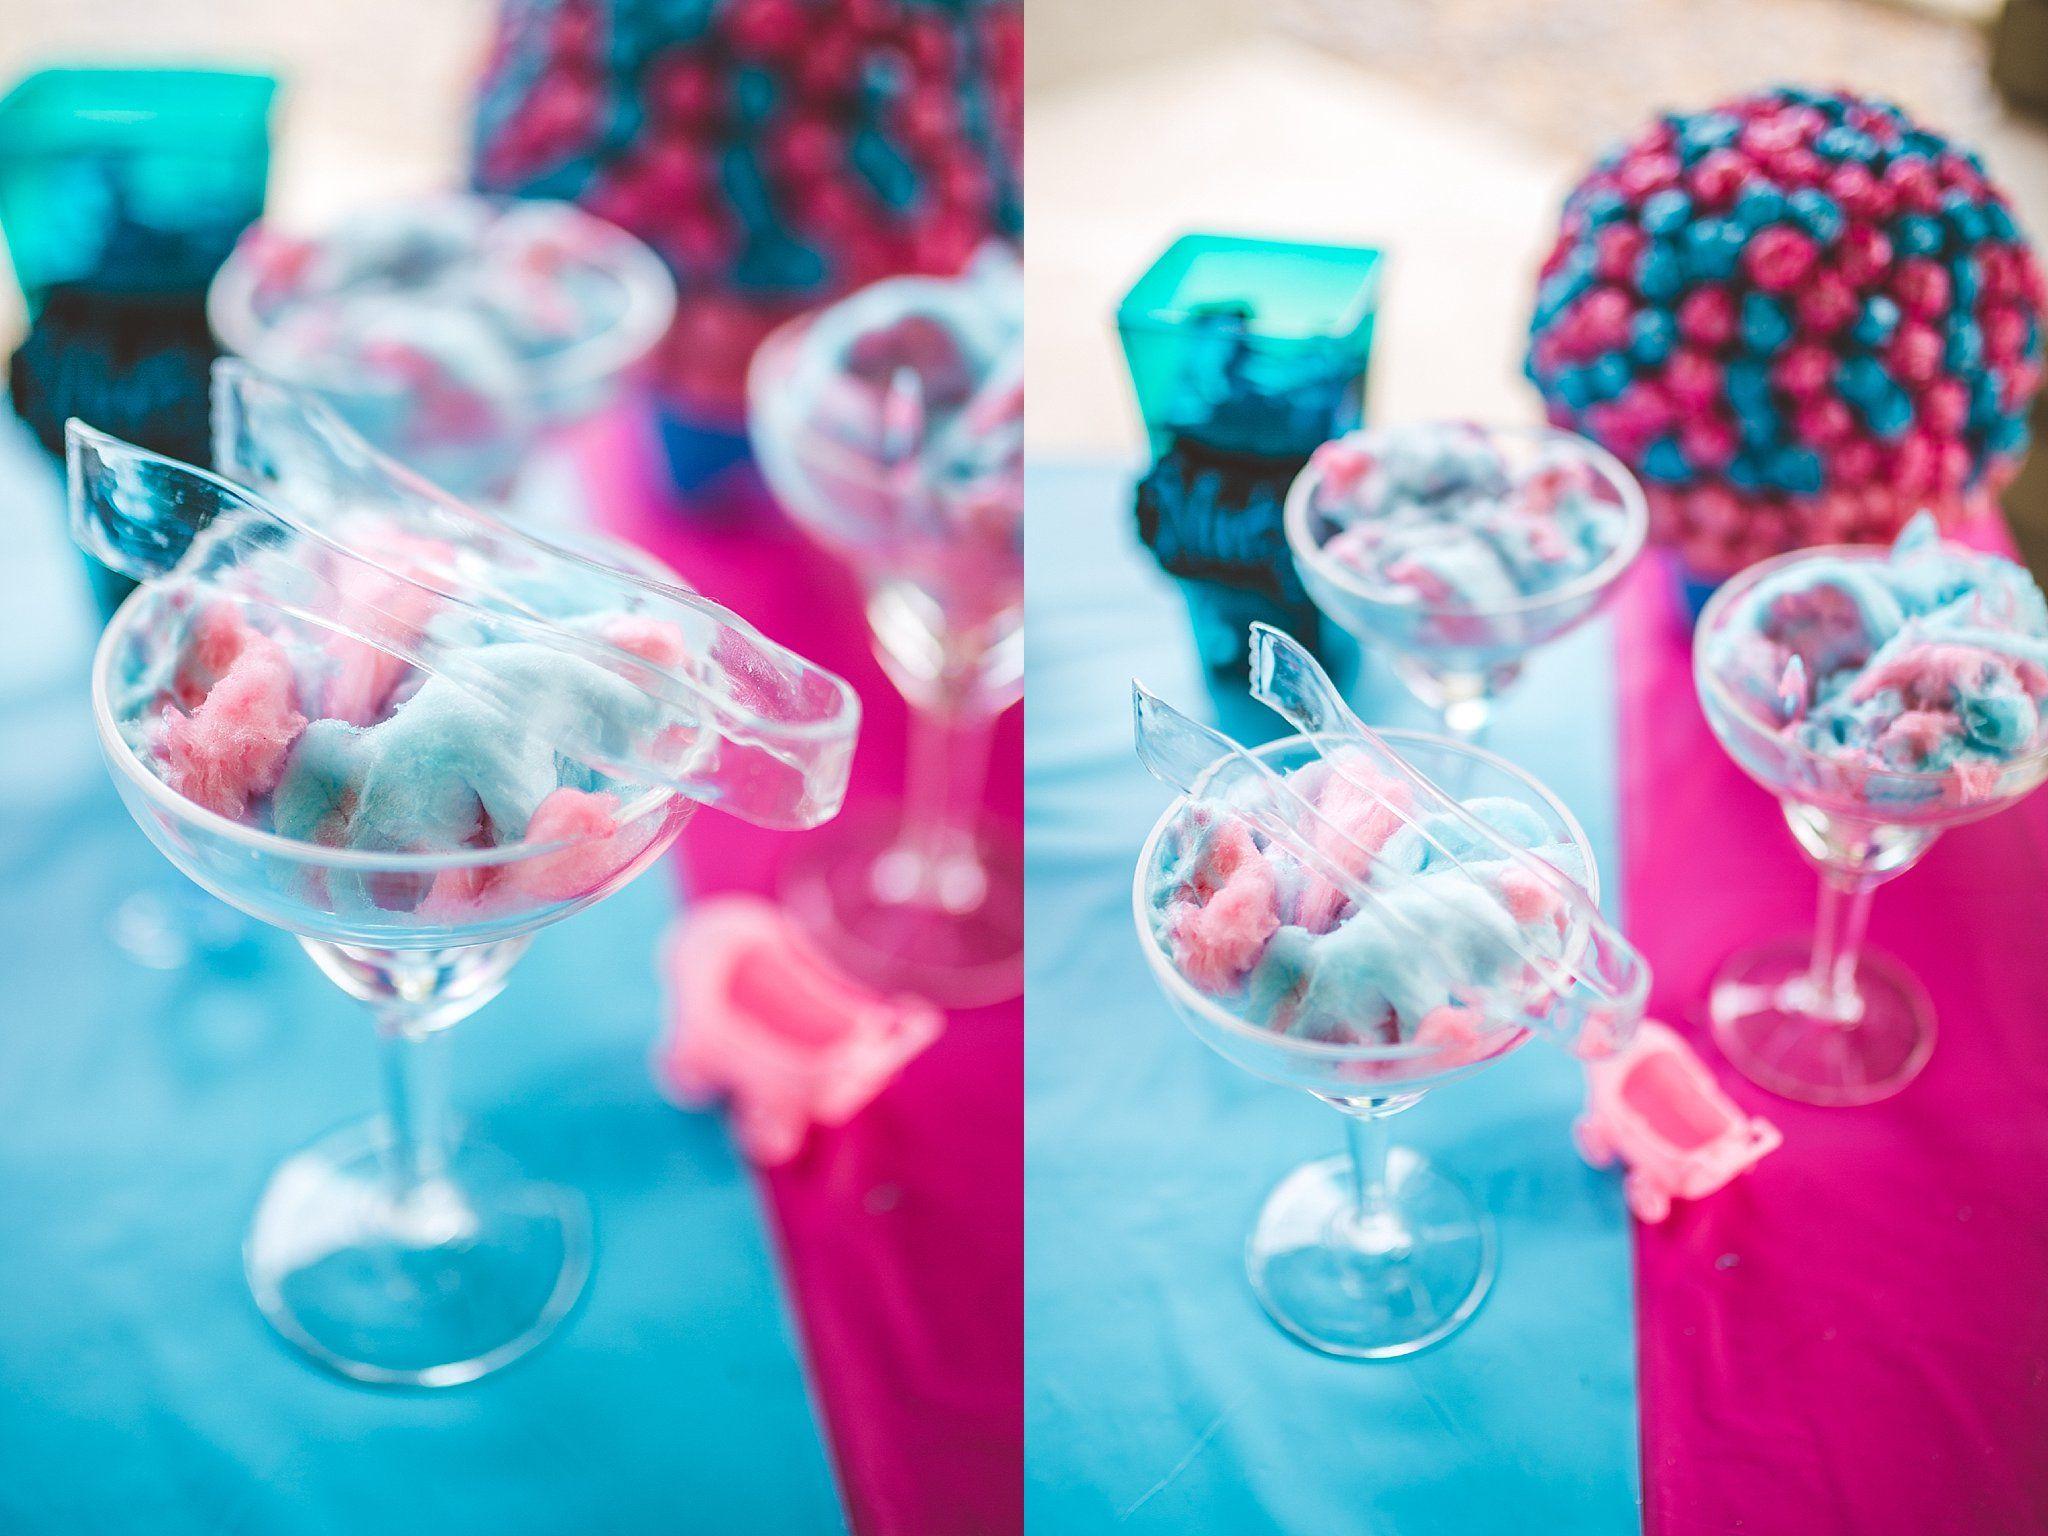 Diy Gender Reveal Mississippi Photography Photoshoot By Tristan Duplichain Gender Reveal Diy Gender Reveal Budget Party